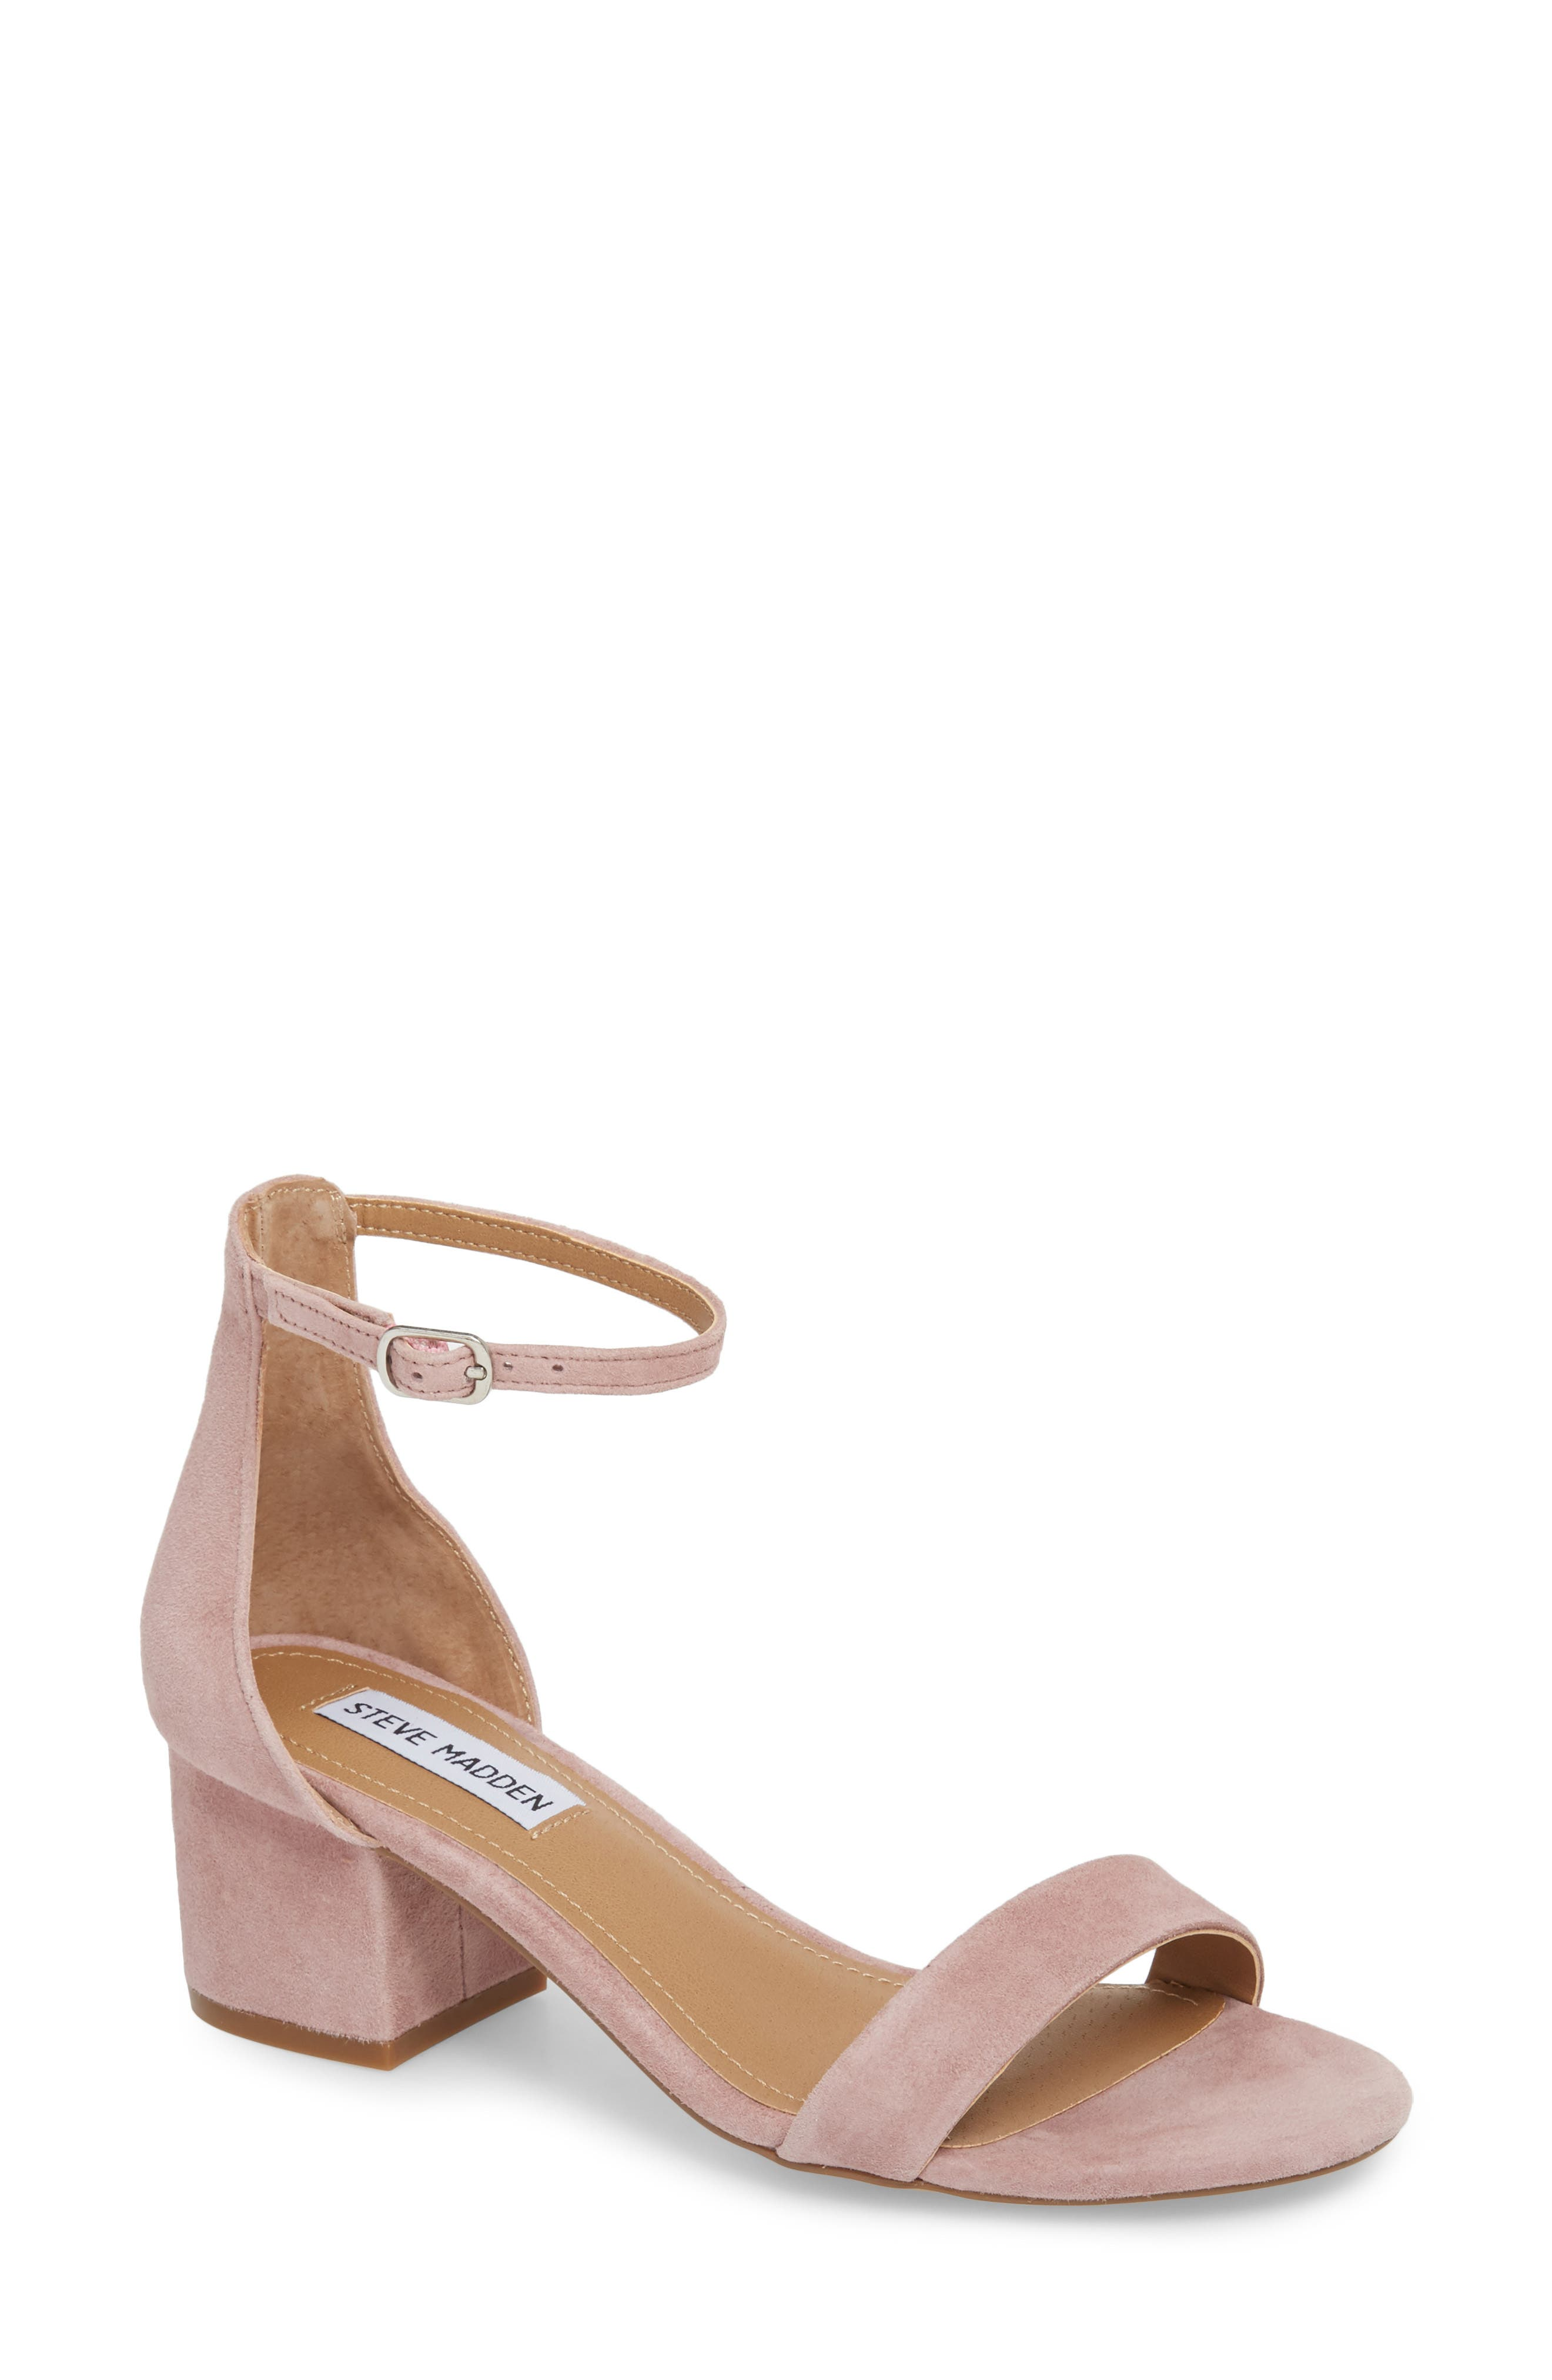 Irenee Ankle Strap Sandal,                         Main,                         color, Mauve Suede